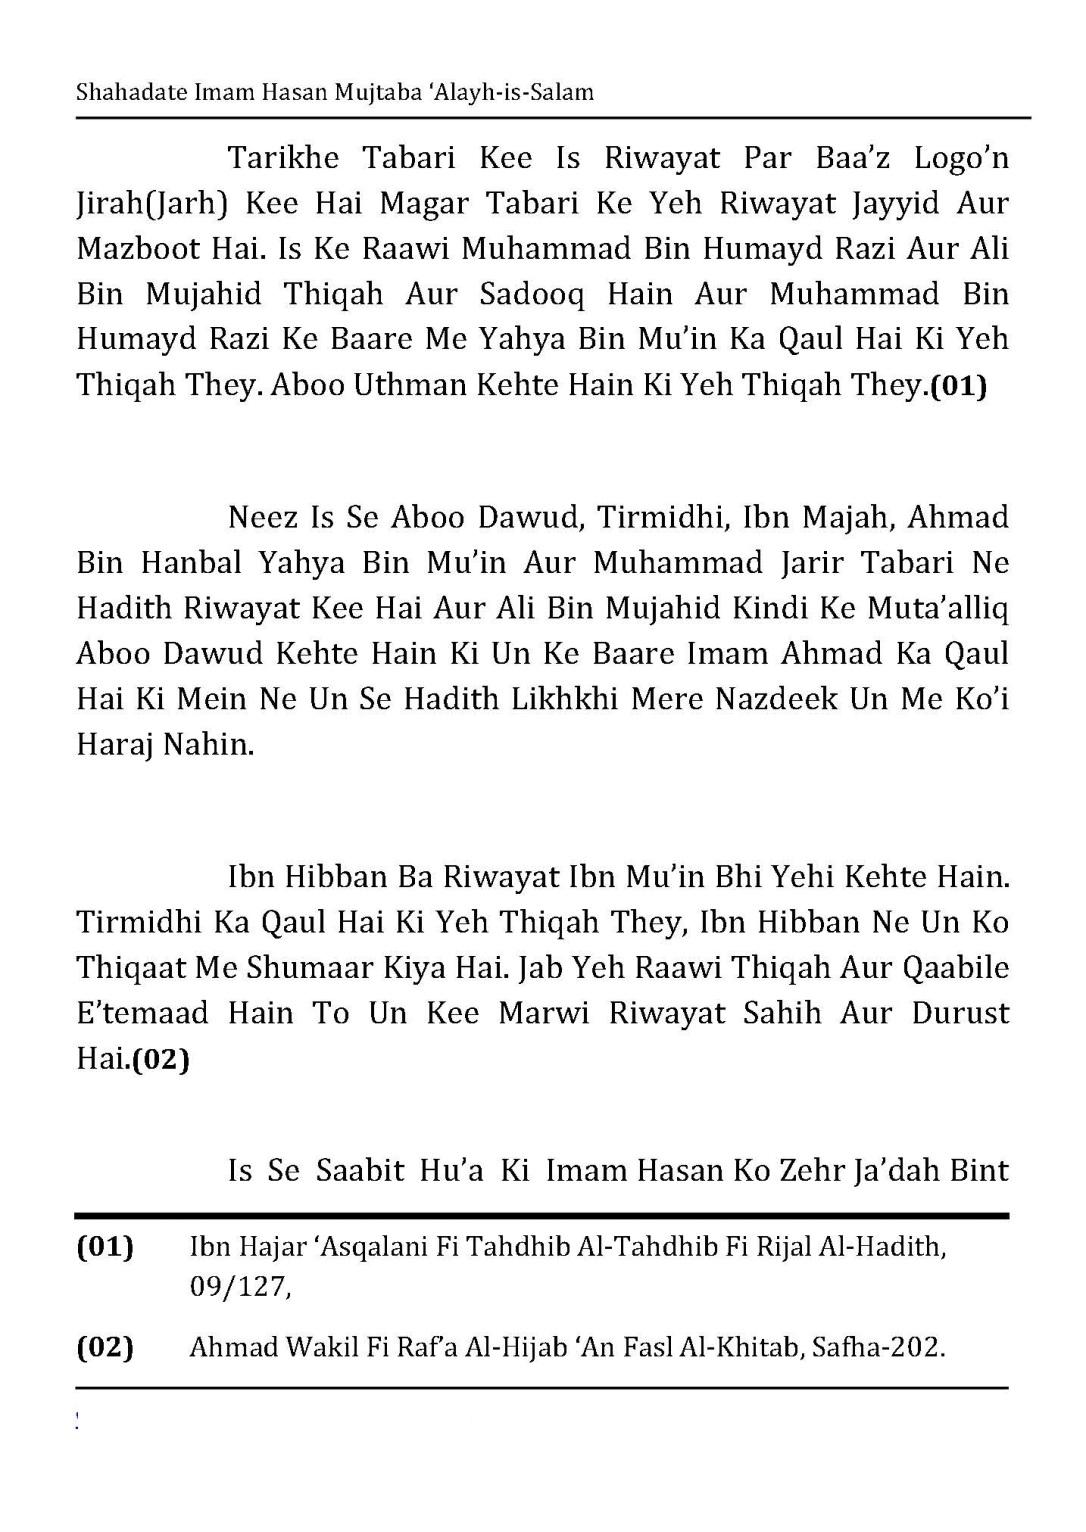 shahadate-imam-hasan-mujtaba-e28098alayh-is-salam-pdf_unlocked_Page_15